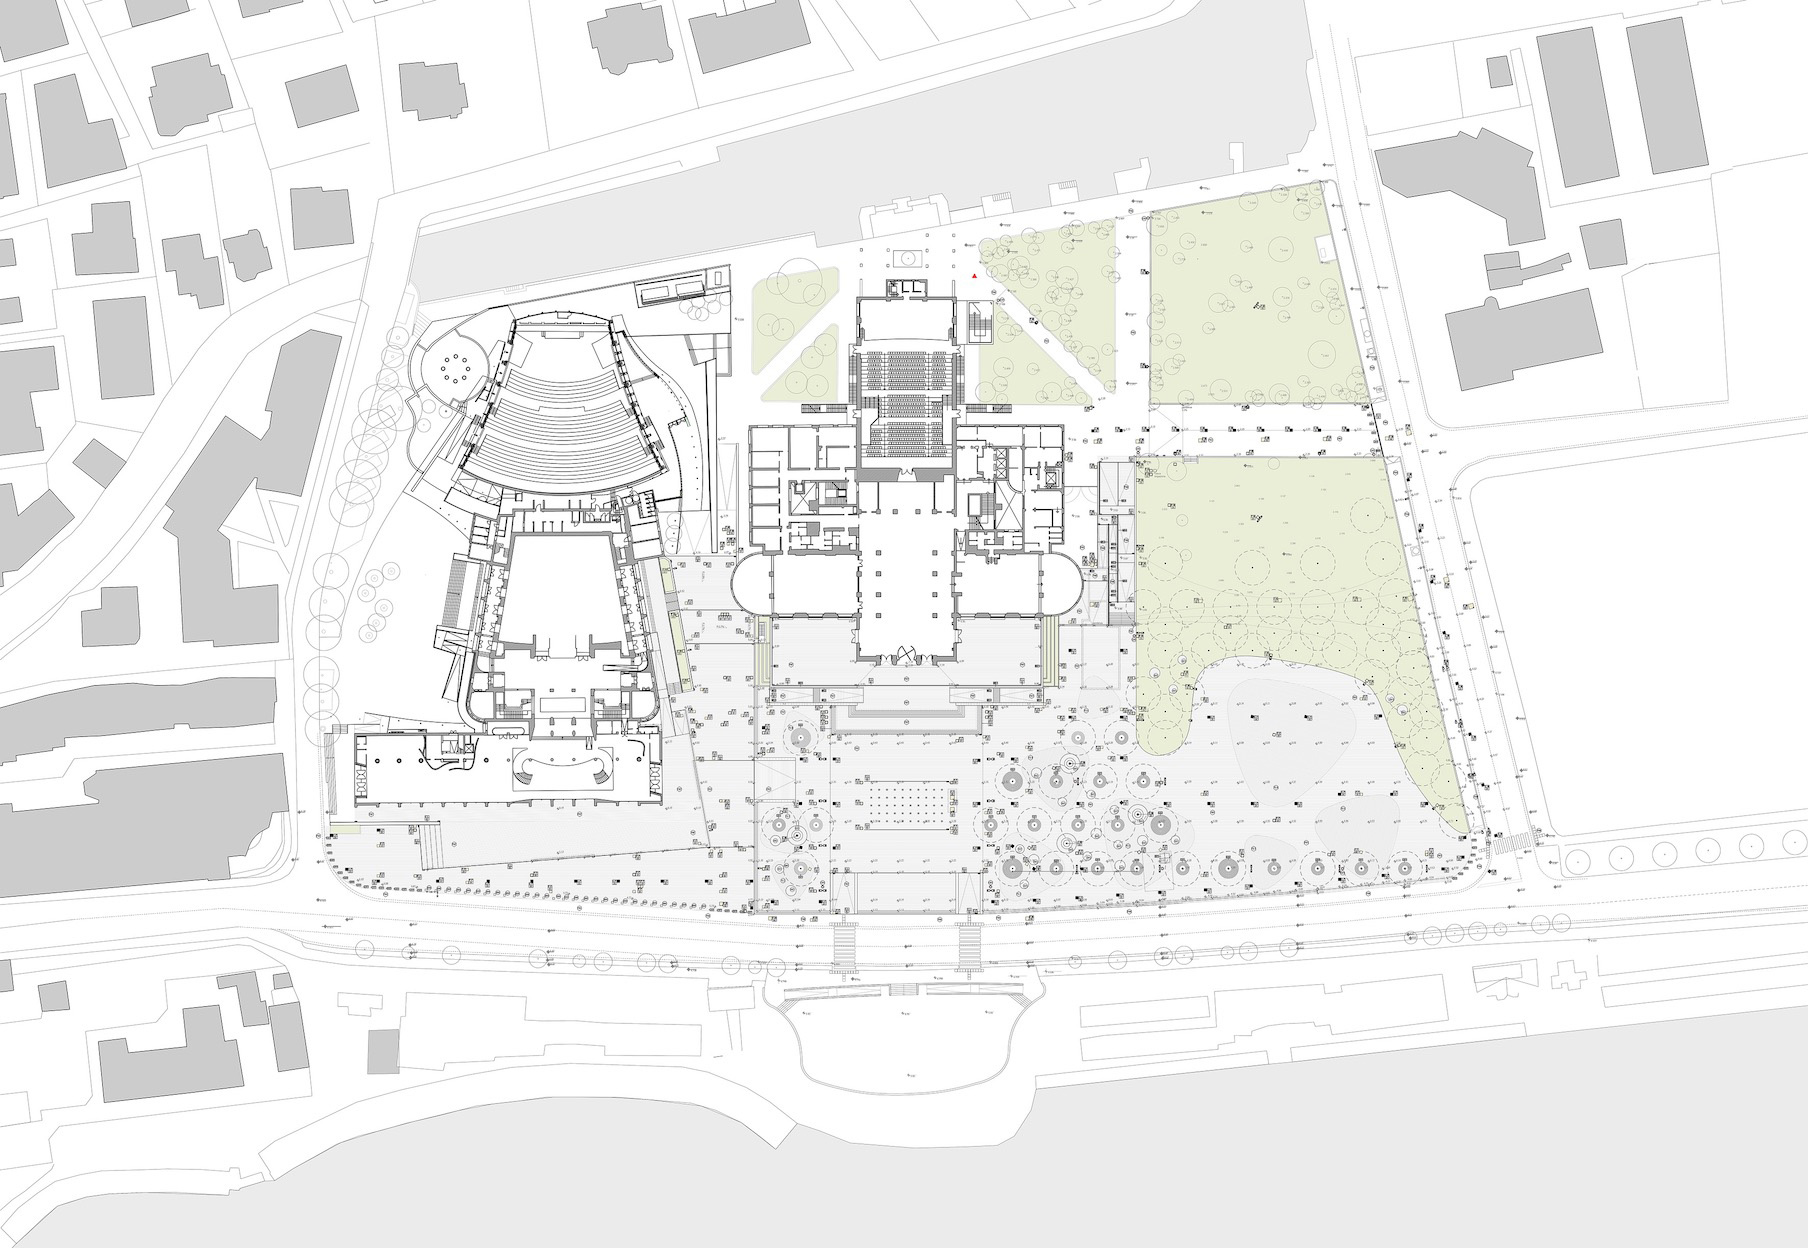 Planimetria Piazza Cinema Venezia